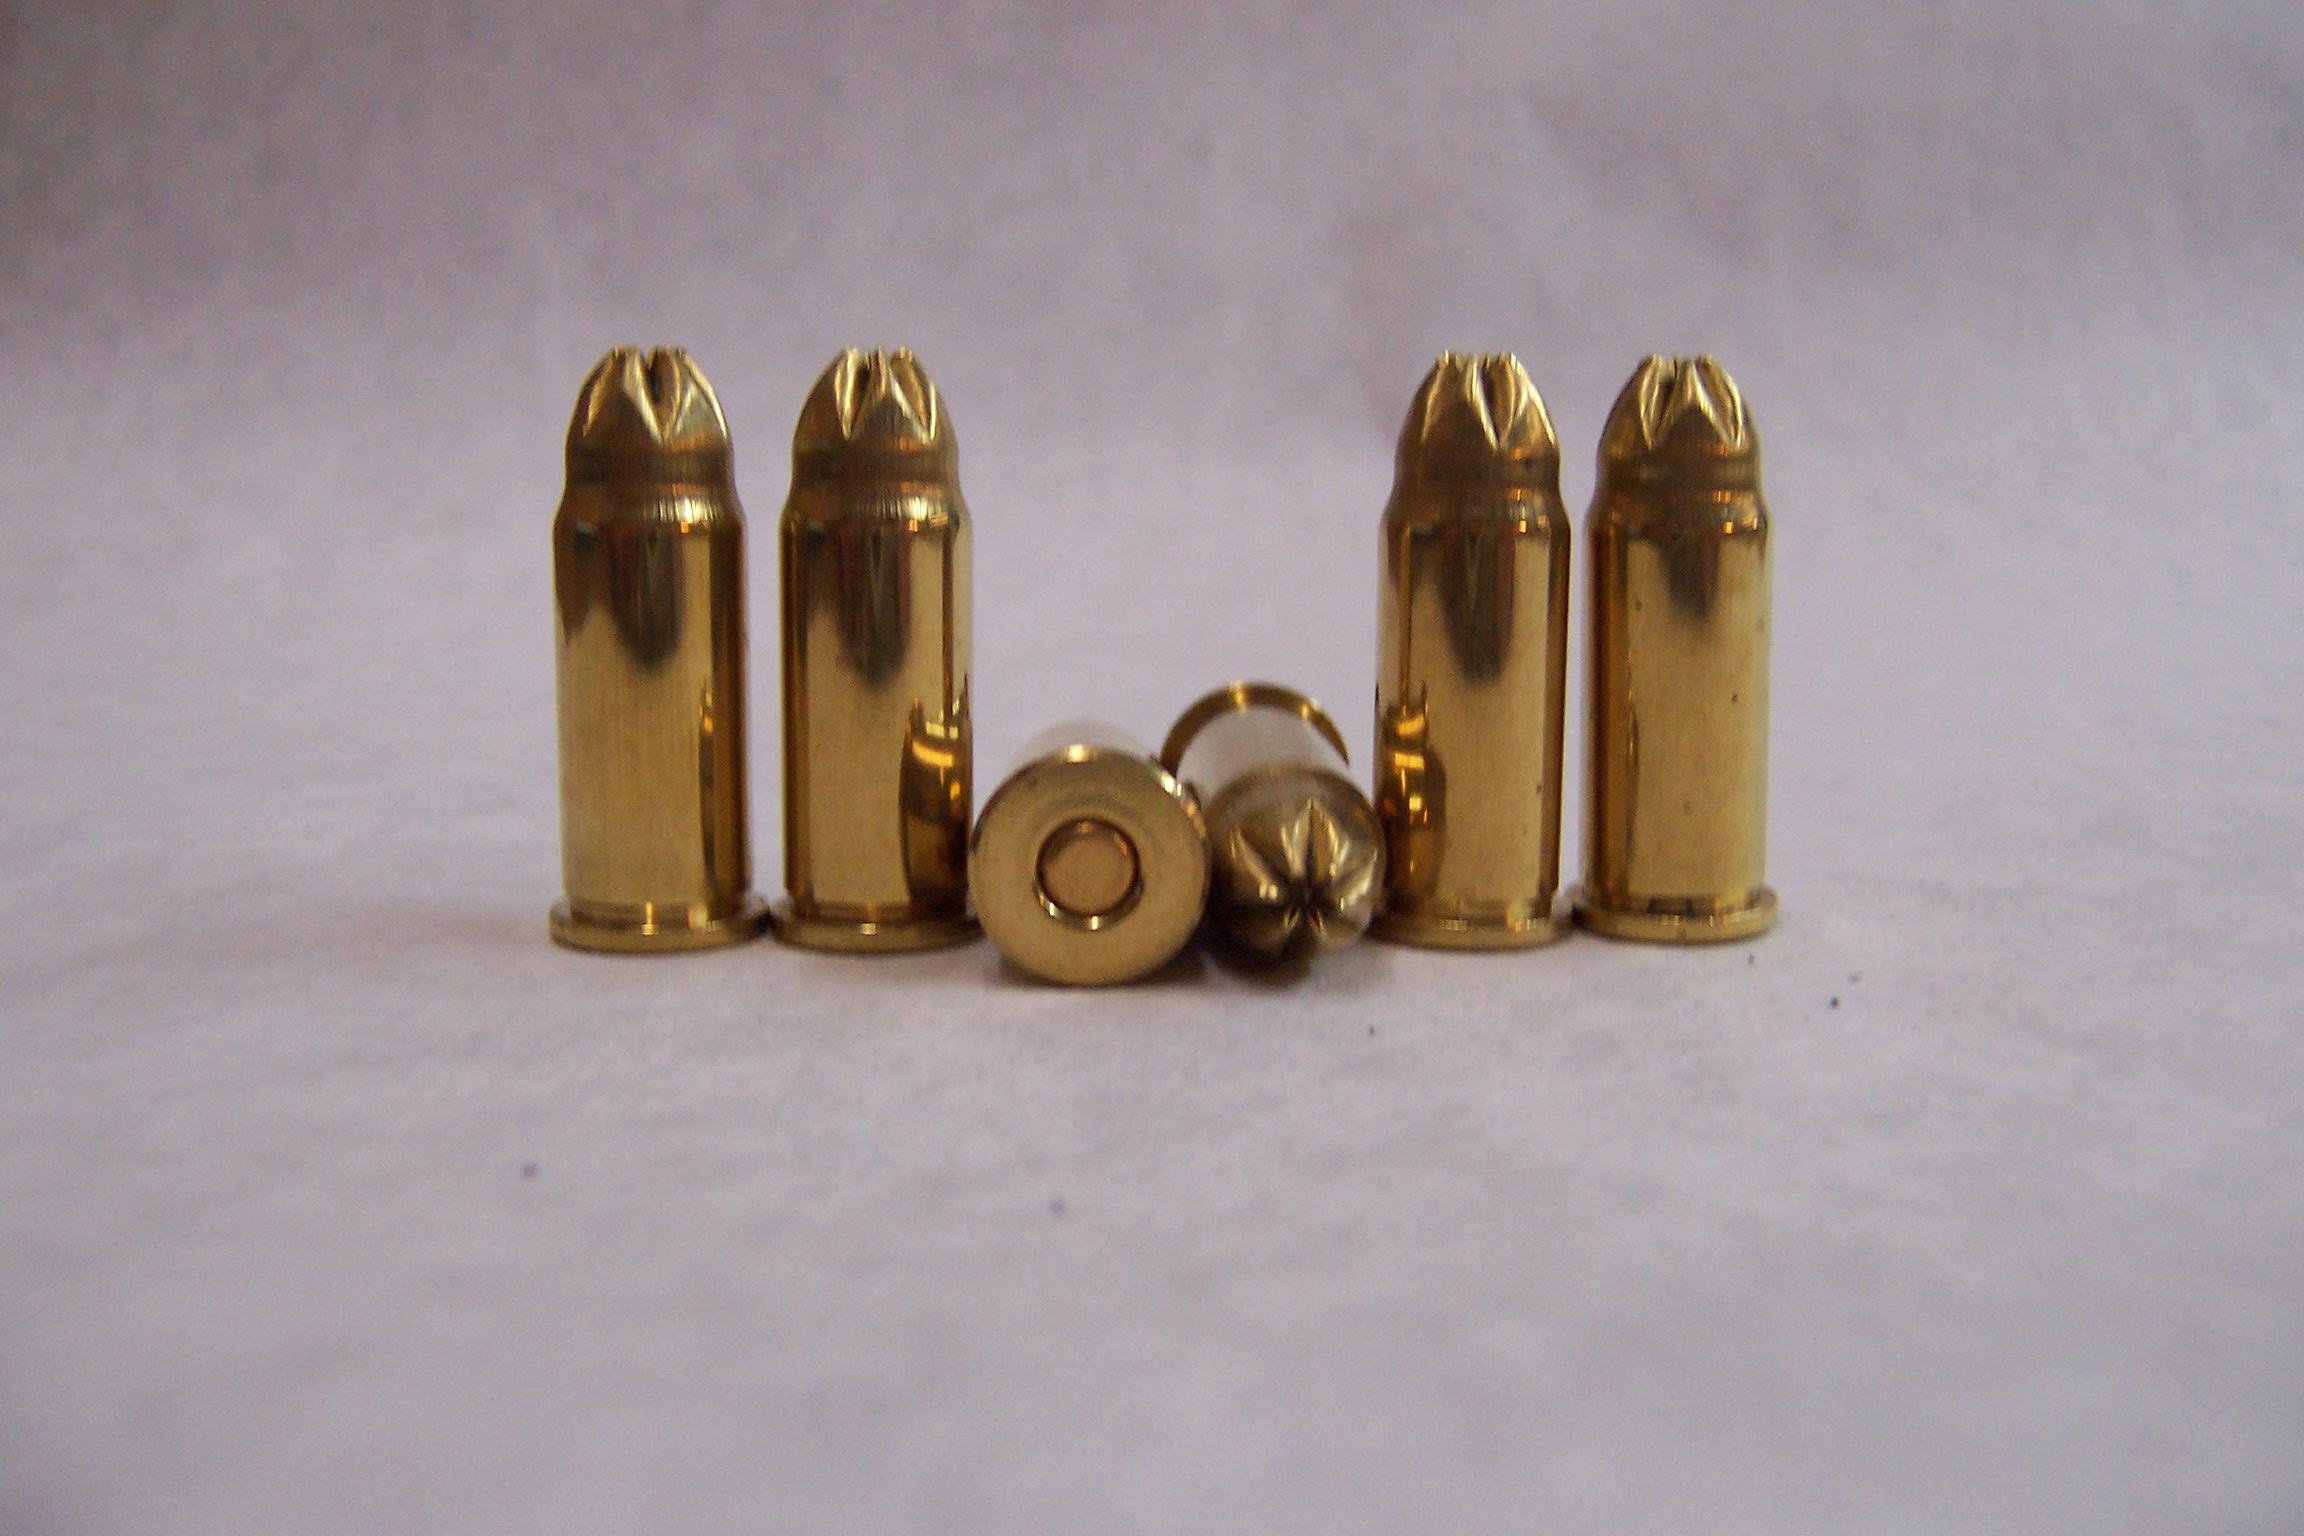 Handgun Blanks for Sale: 32 Caliber, 38 Special, 45 ACP